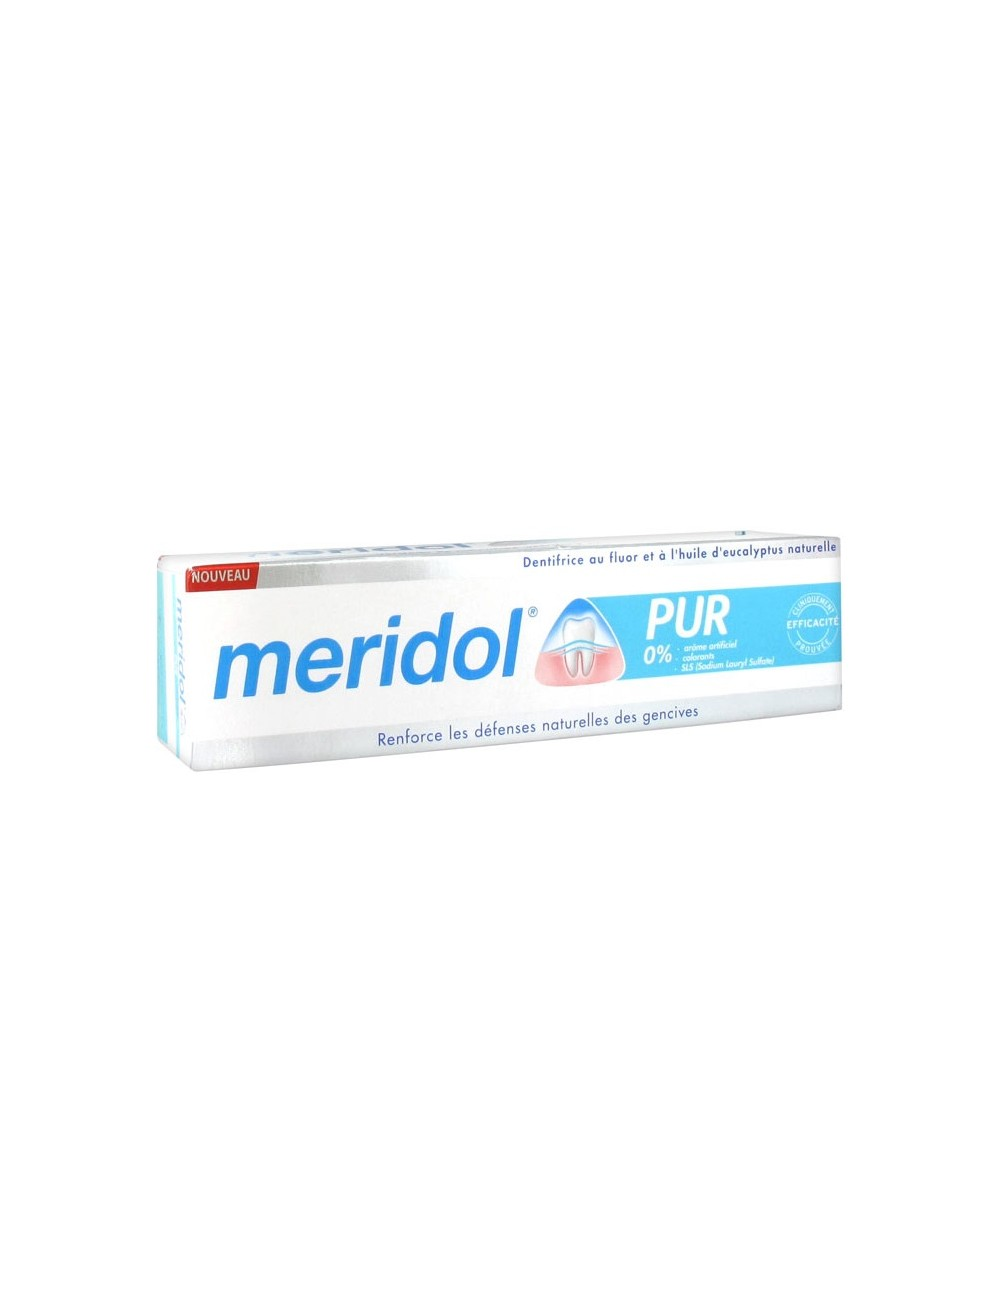 Meridol Pasta do Zębów Pur 75 ml (FR)